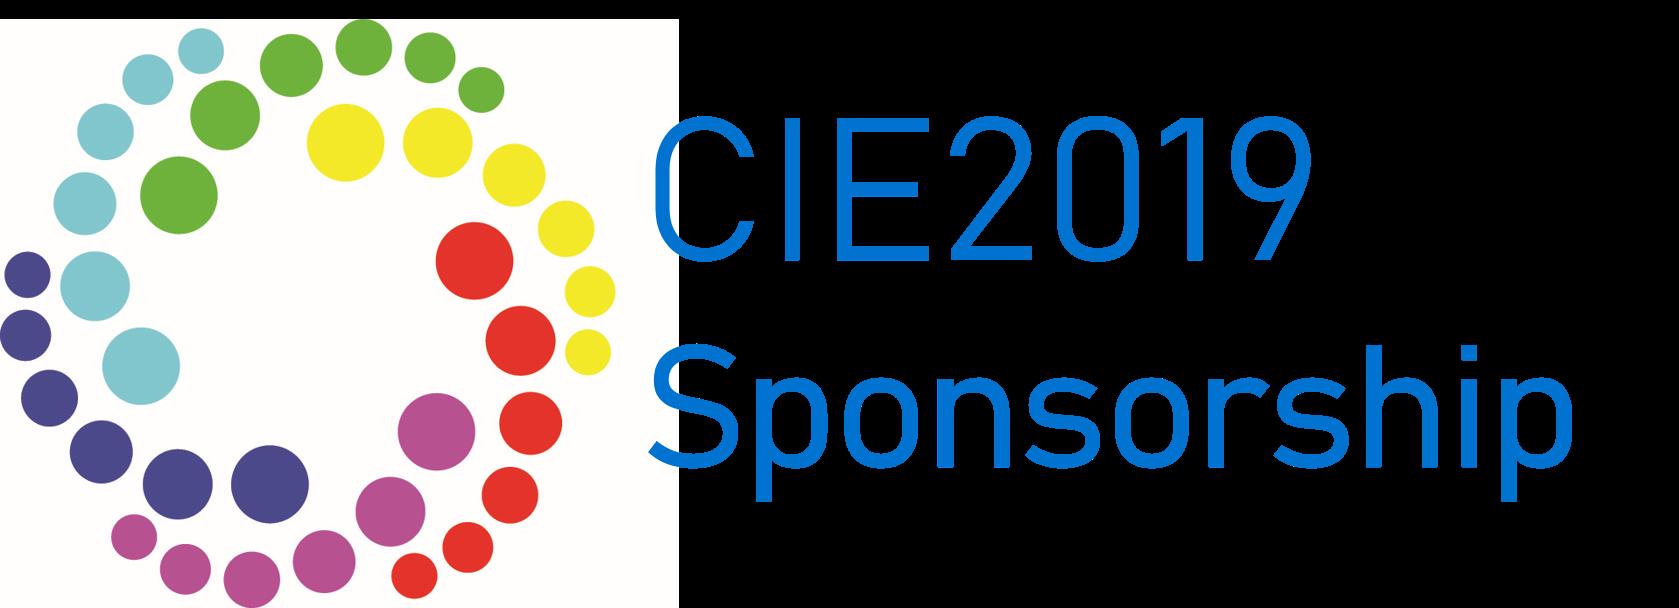 CIE 2019 sponsorship